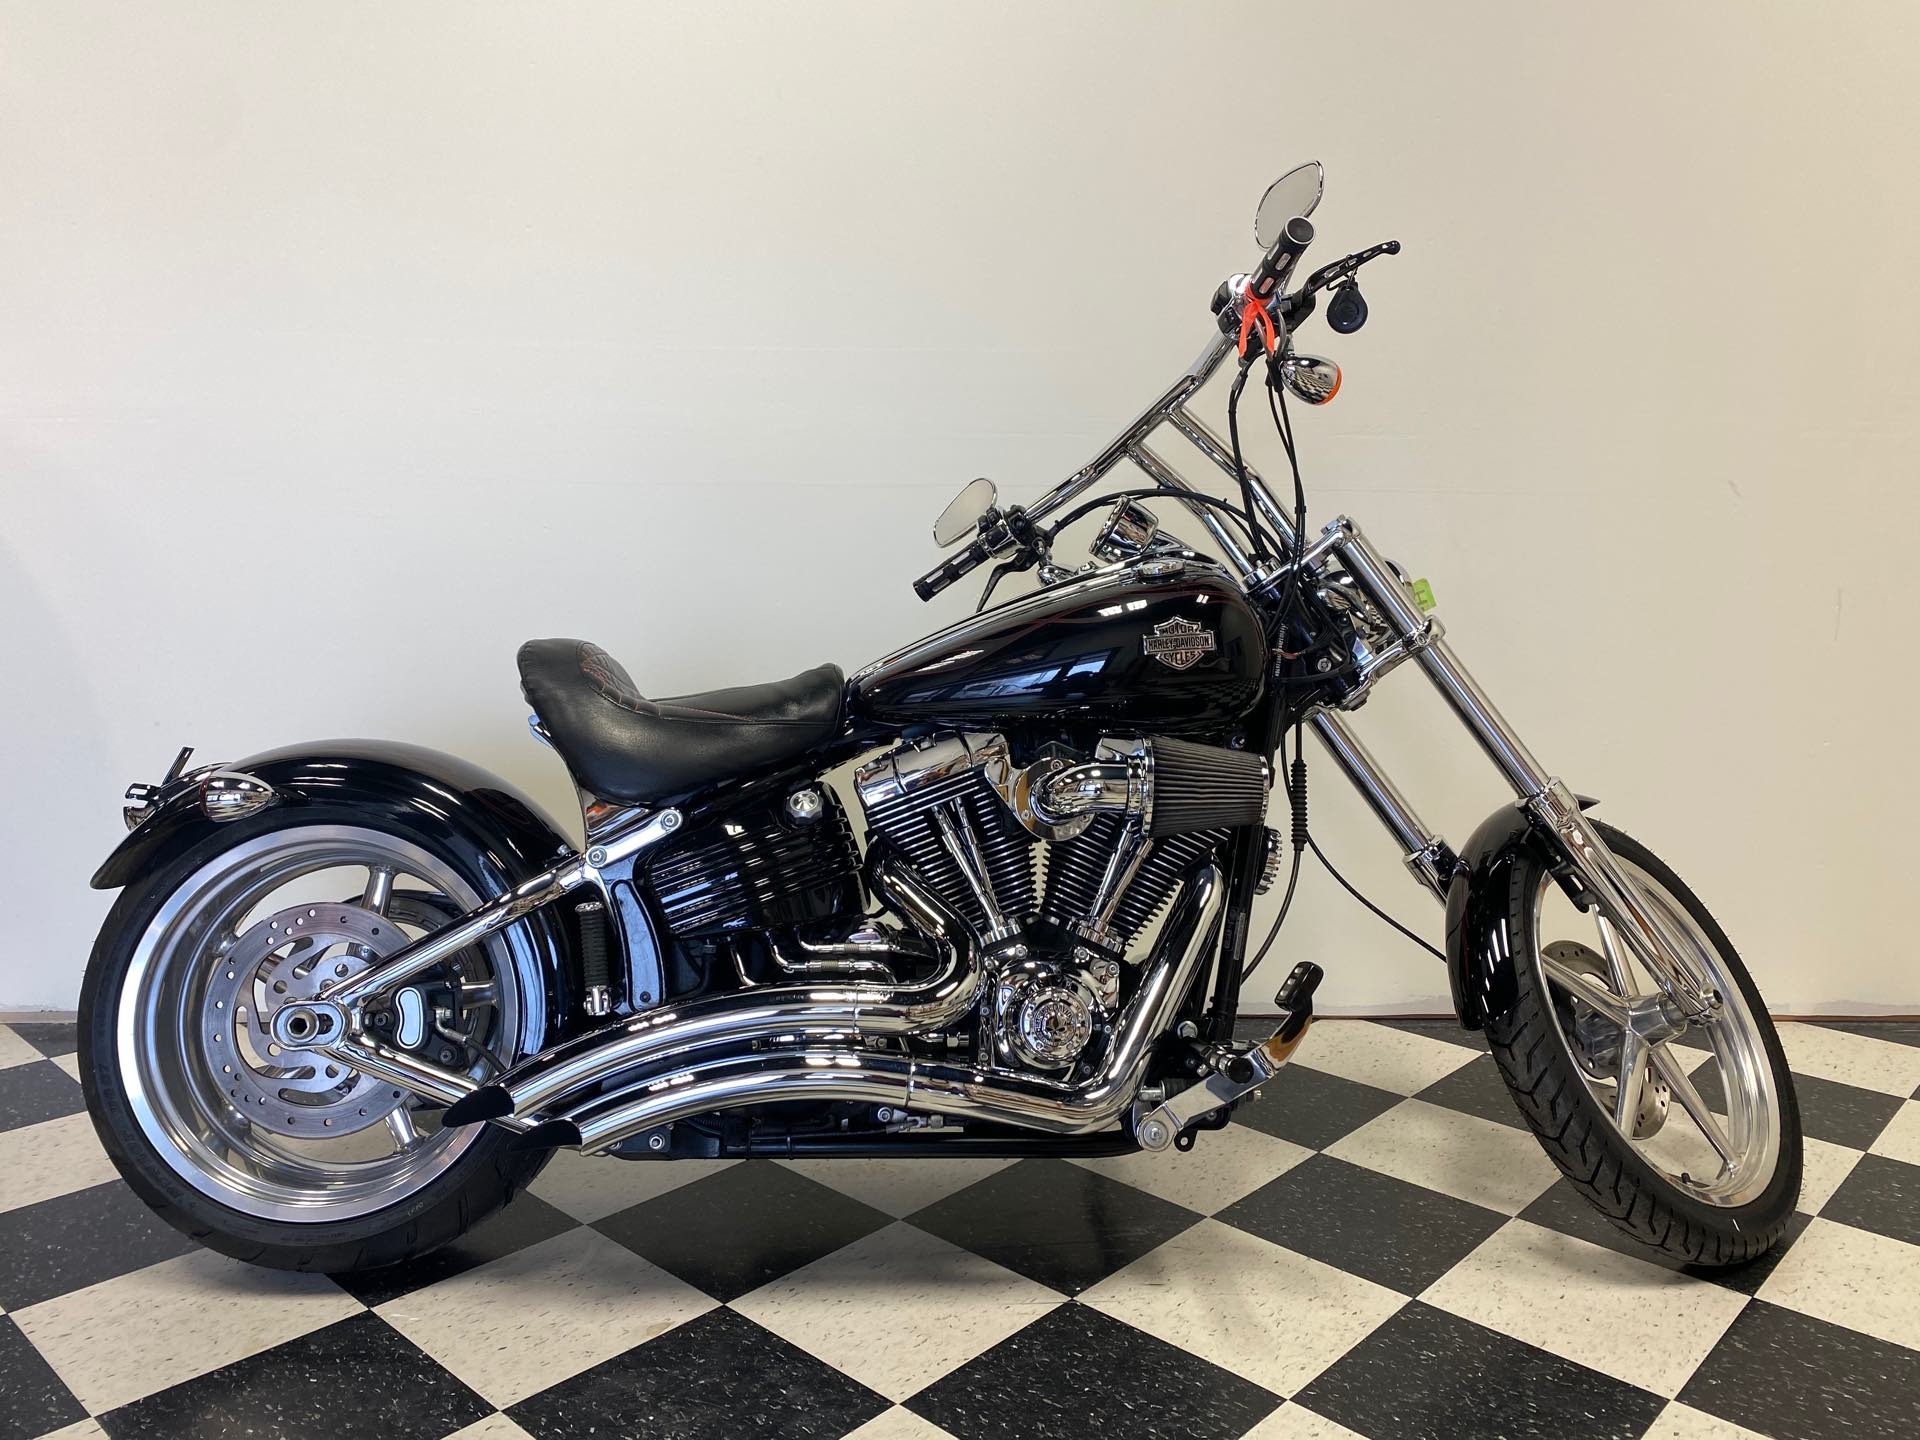 2008 Harley-Davidson Softail Rocker C at Deluxe Harley Davidson